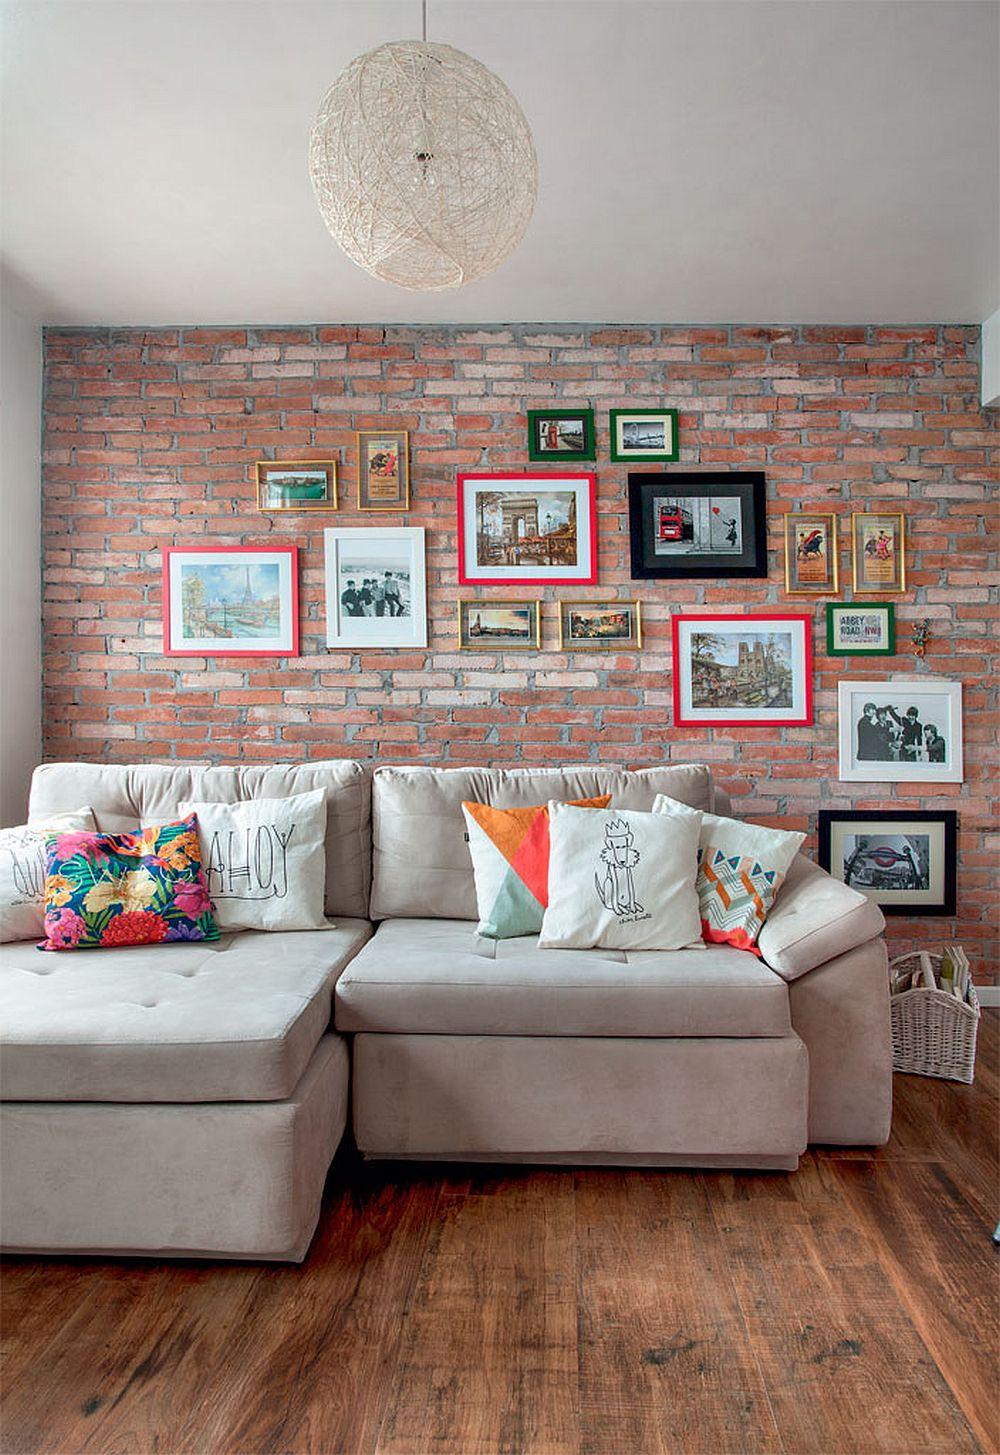 adelaparvu.com despre accente rustice in living deschis catre bucatarie, design blogger Ana Loureiro  (5)